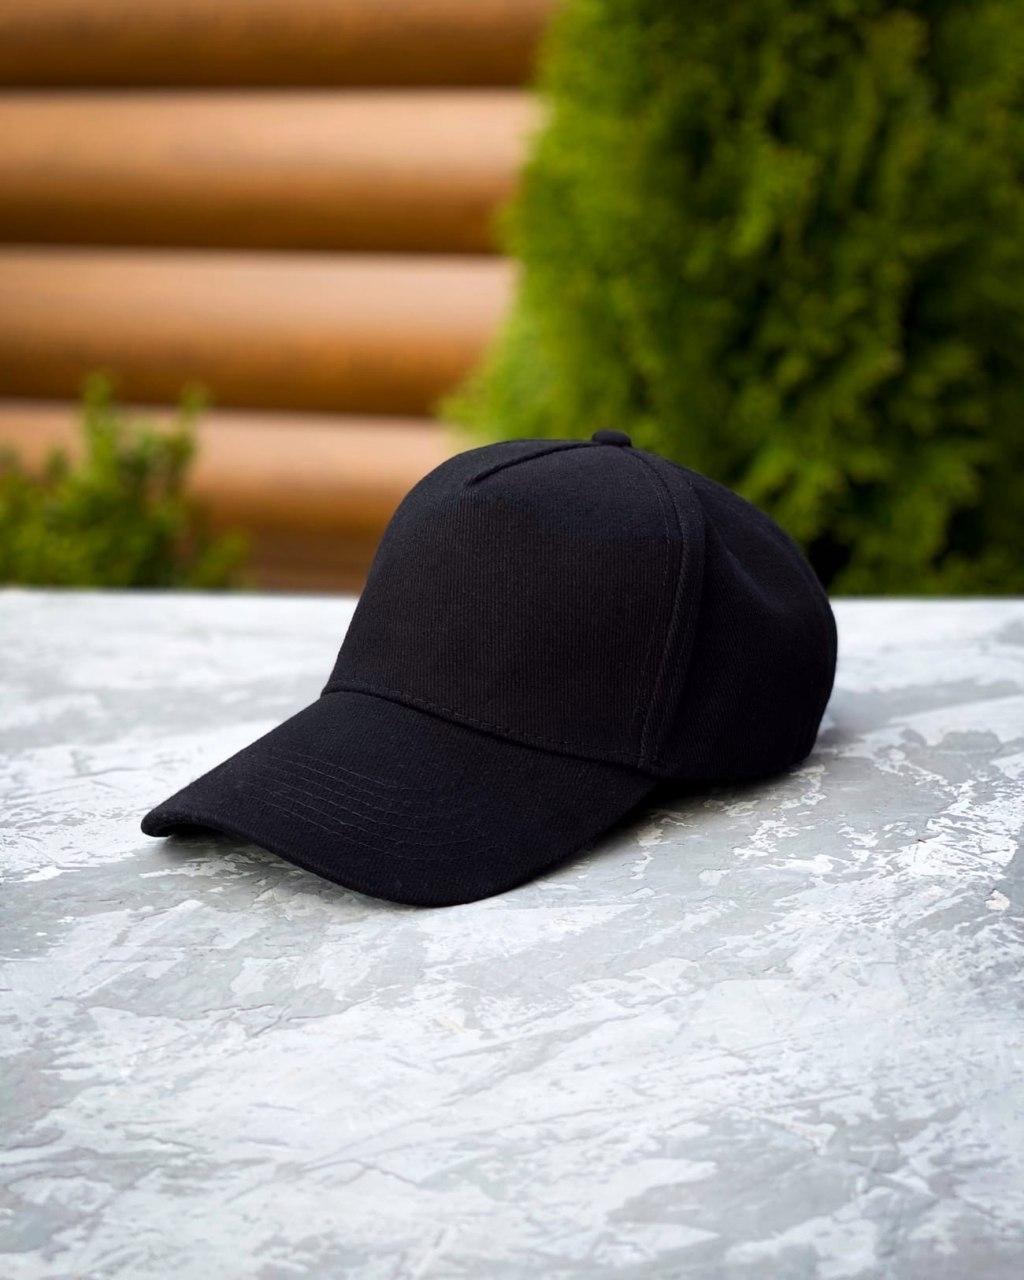 Кепка черная без принта